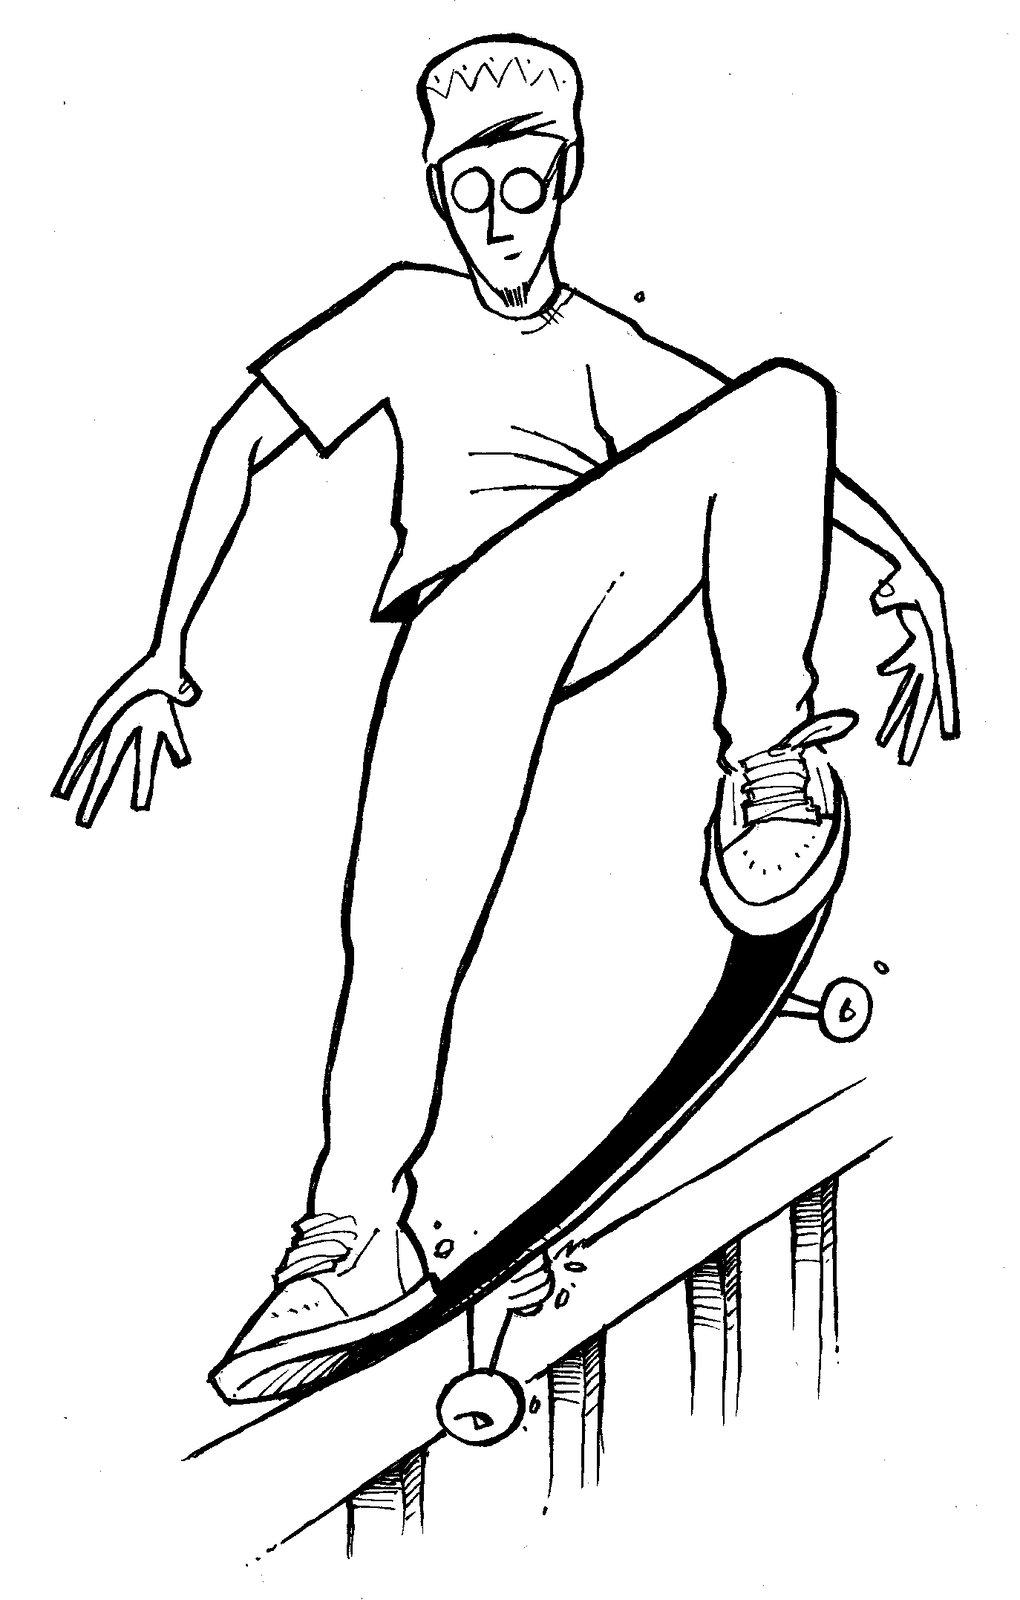 bent arm diagram 5 10 malawi24 de Furnace Wiring Diagram bent arm diagram wiring diagram database rh windel munity de cartoon bent arm bent arm bone